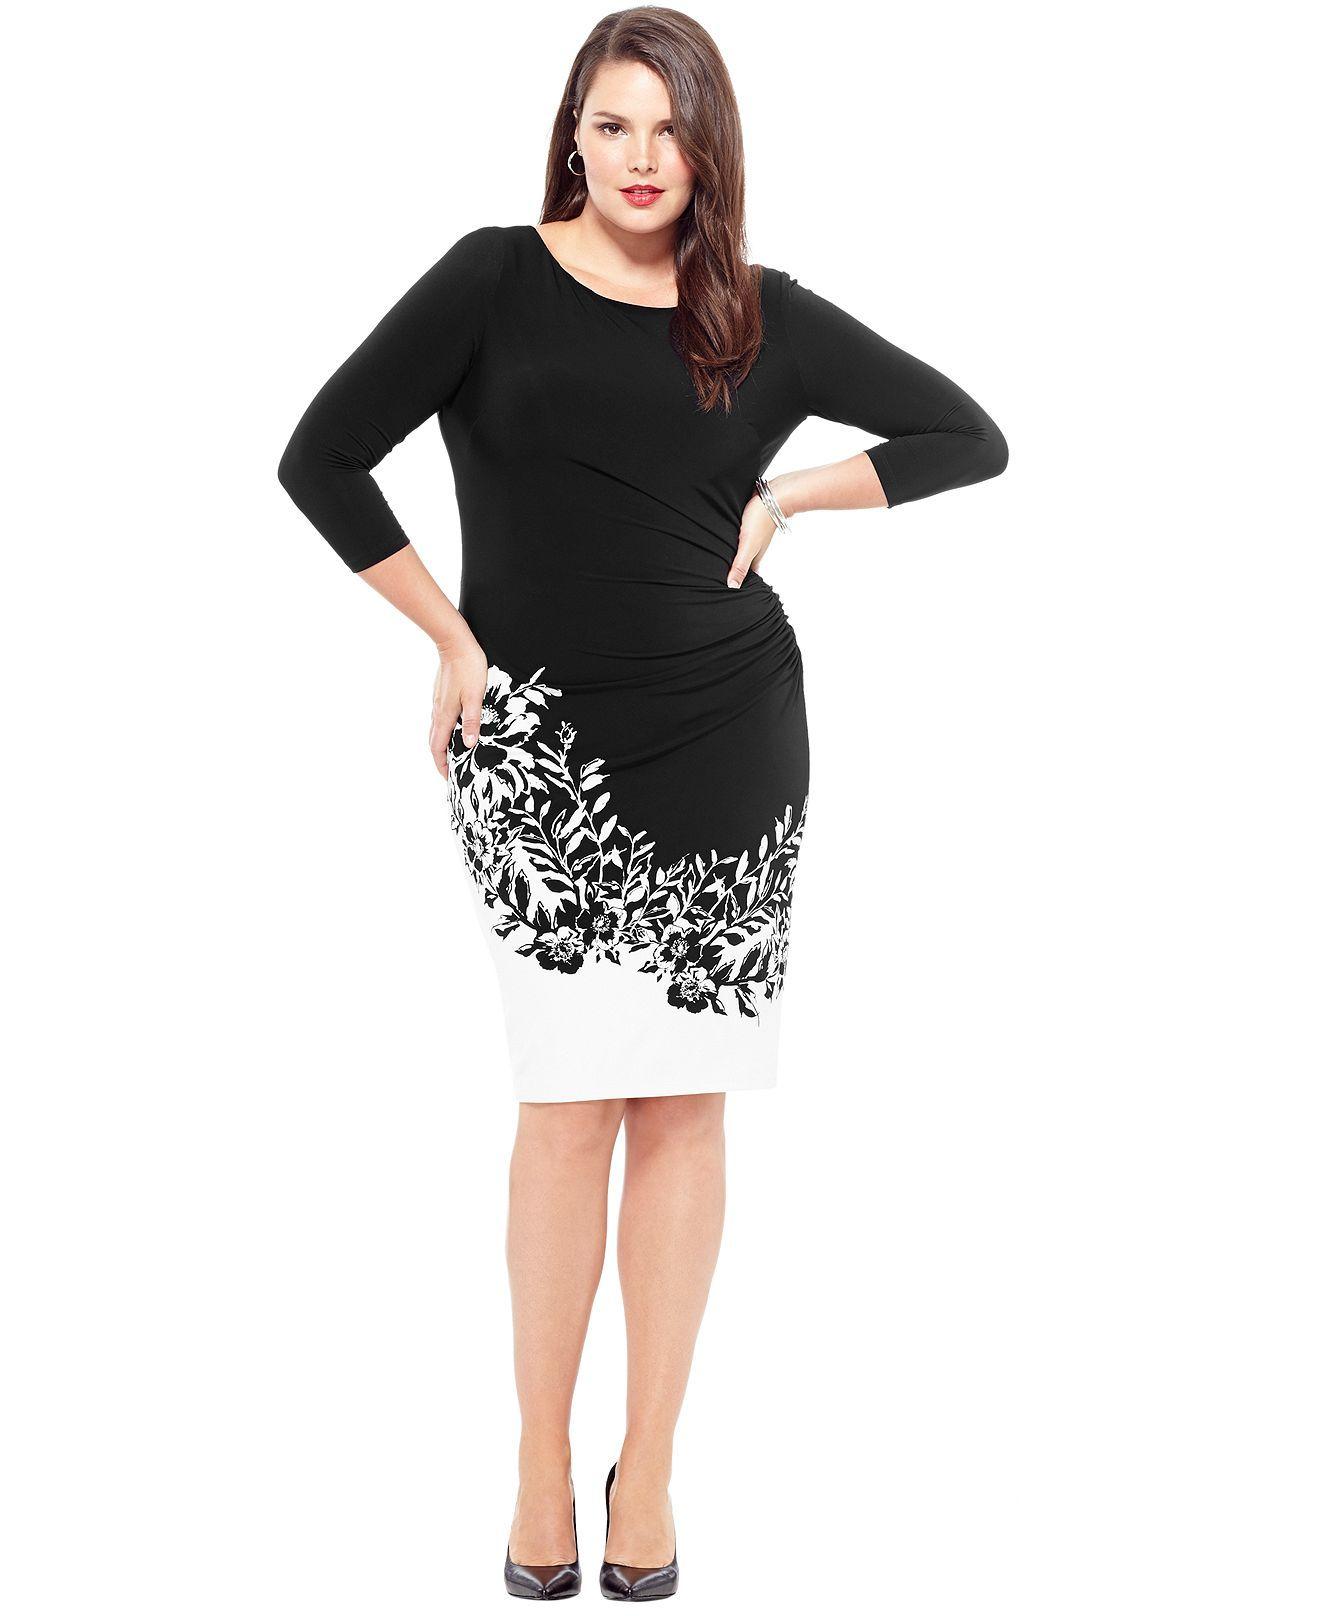 Plus Size Dress Diaries Desk To Dinner Black White Dress Look